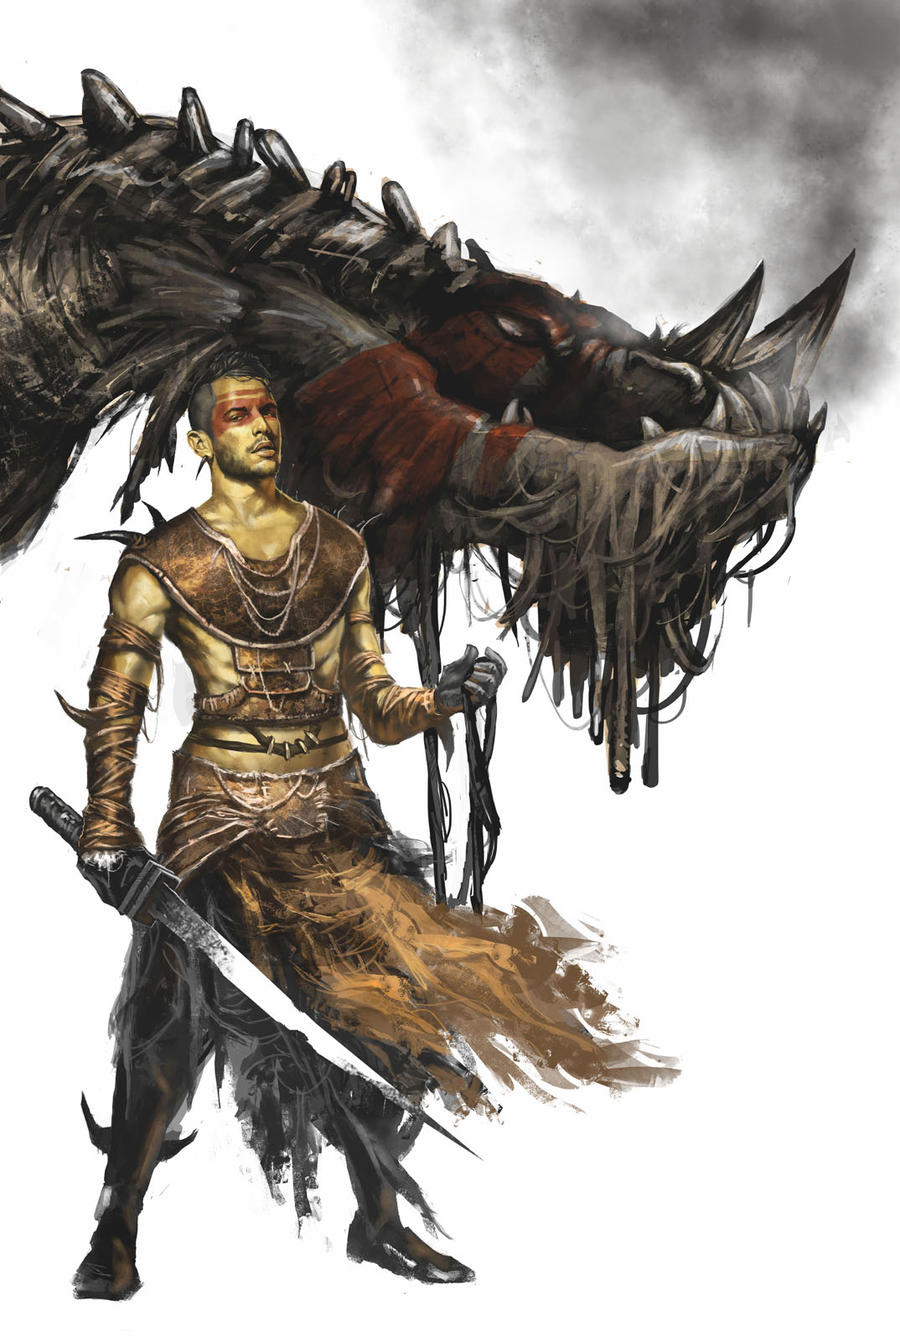 Dragon rider by Trishkell